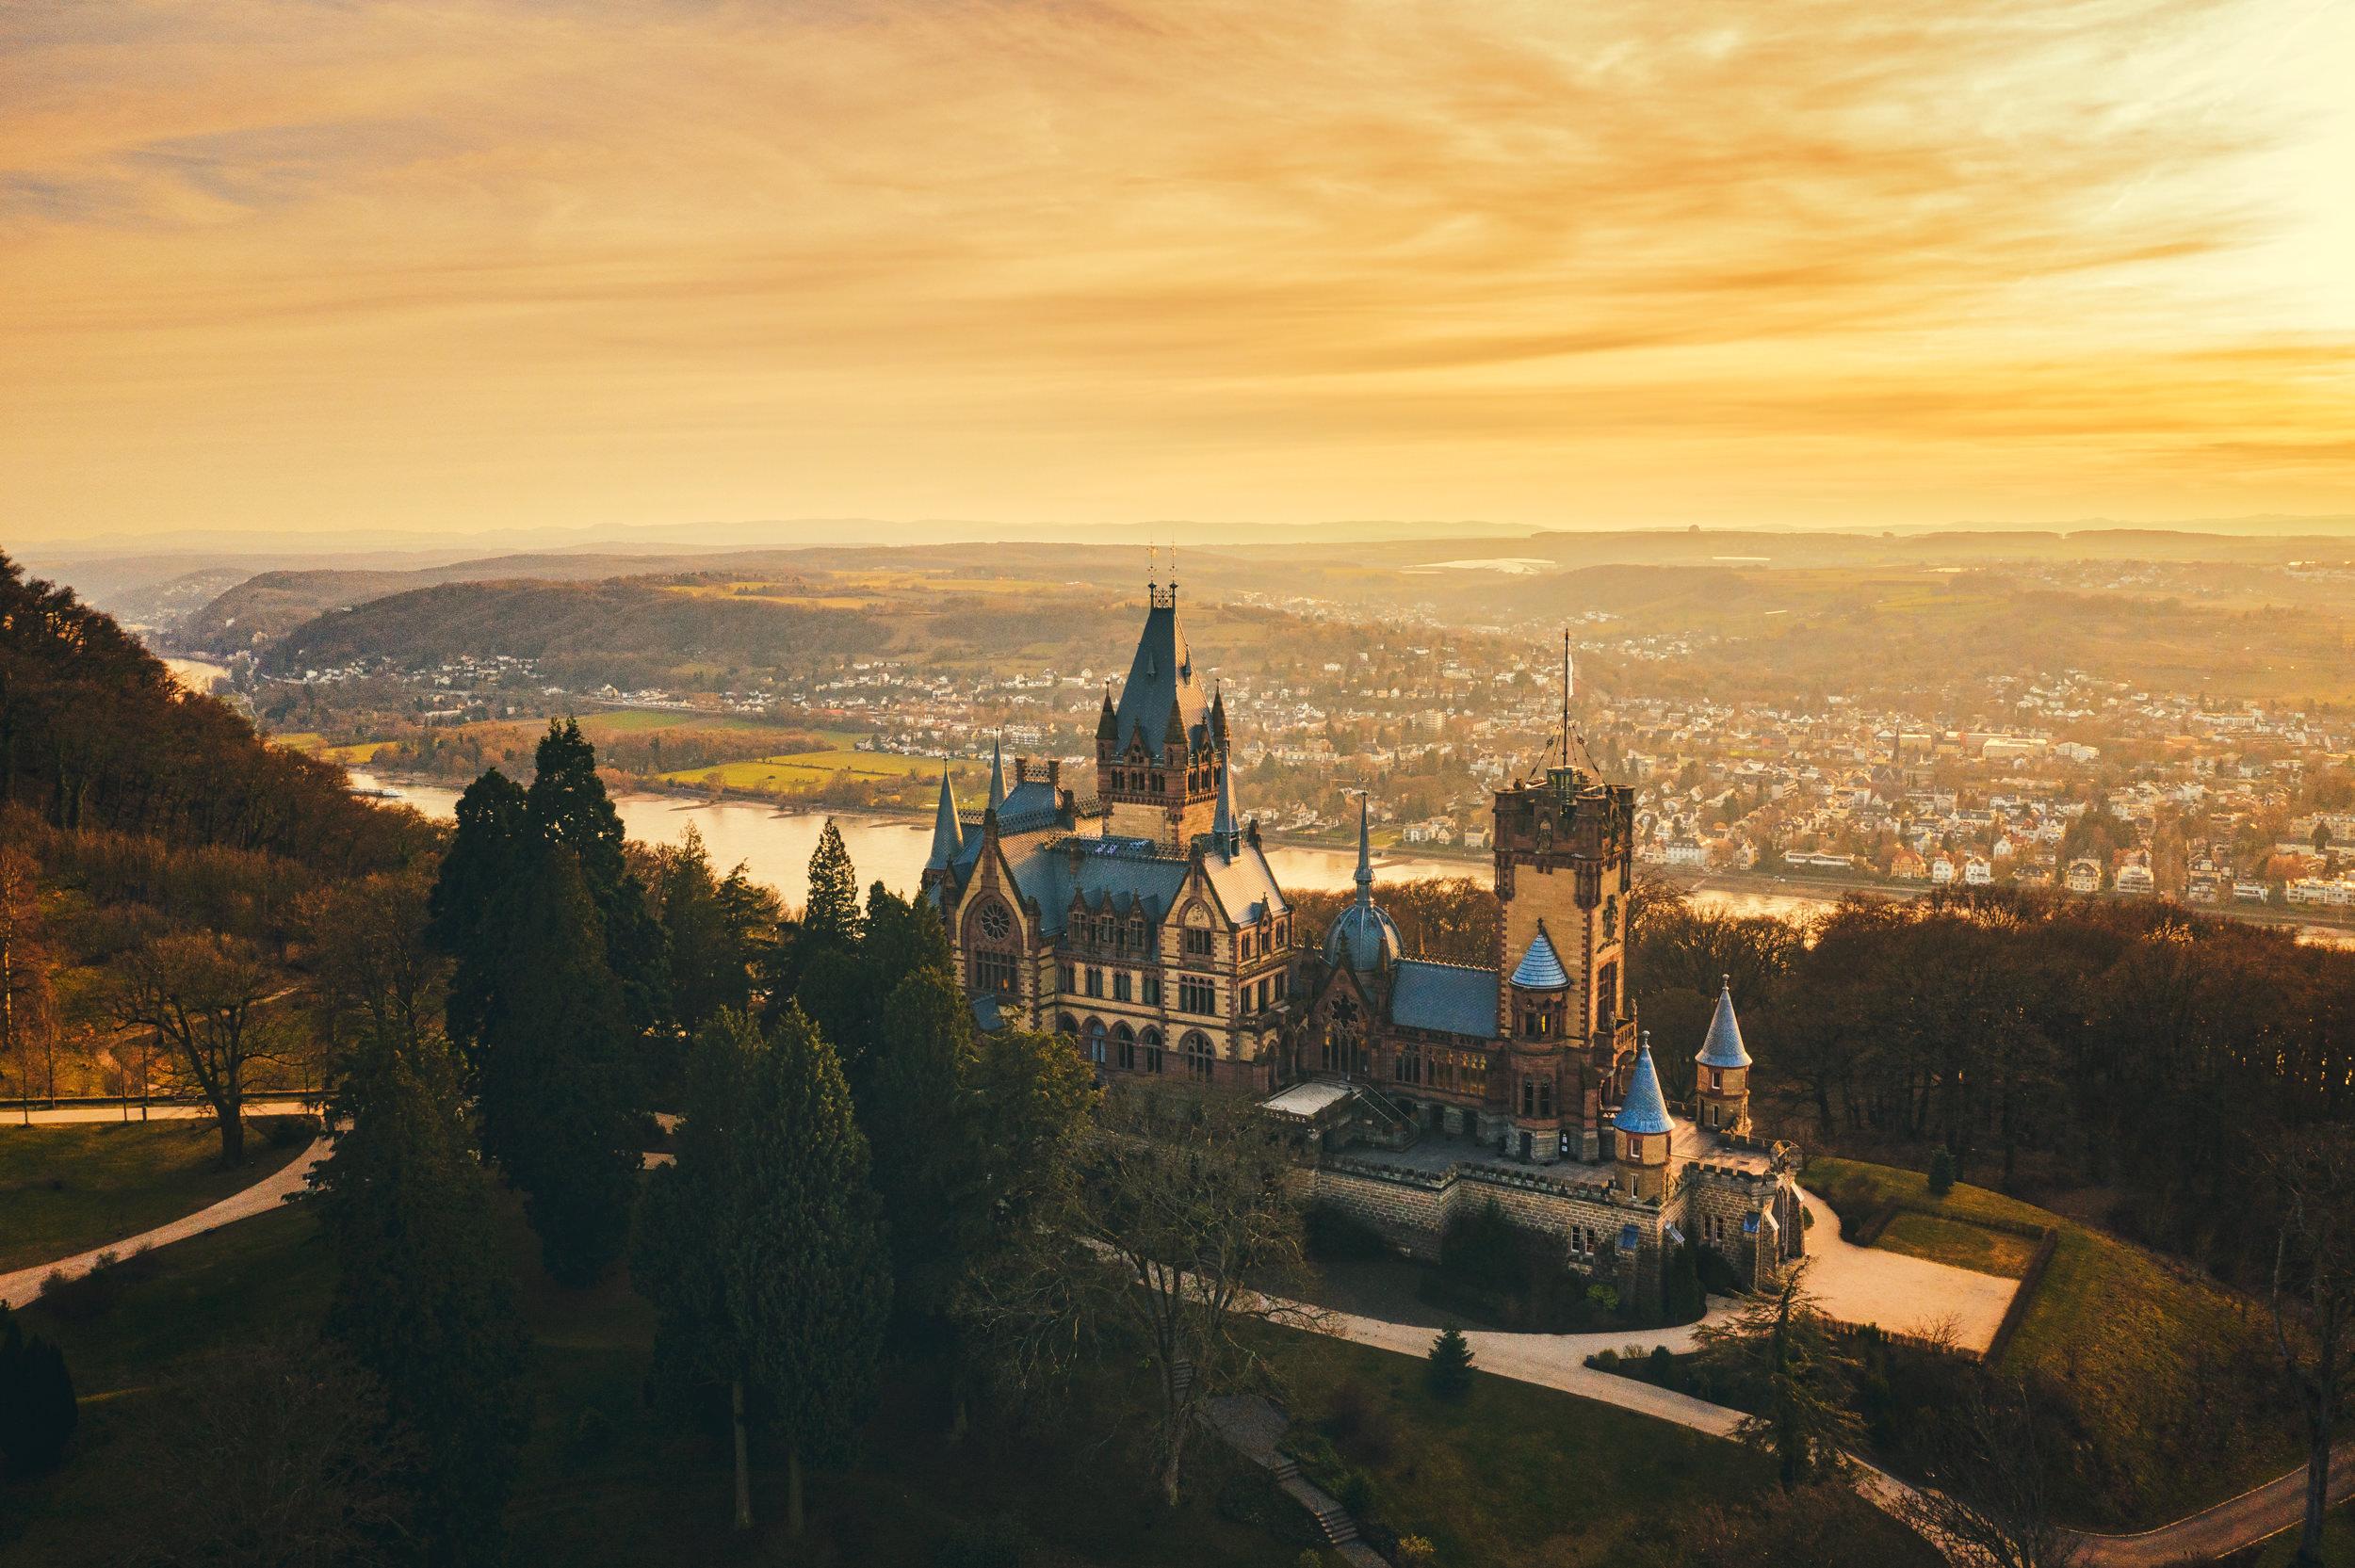 Landschaftsfotografie fotograf filmemacher frankfurt patrick schmetzer drohne landschaft natur 61